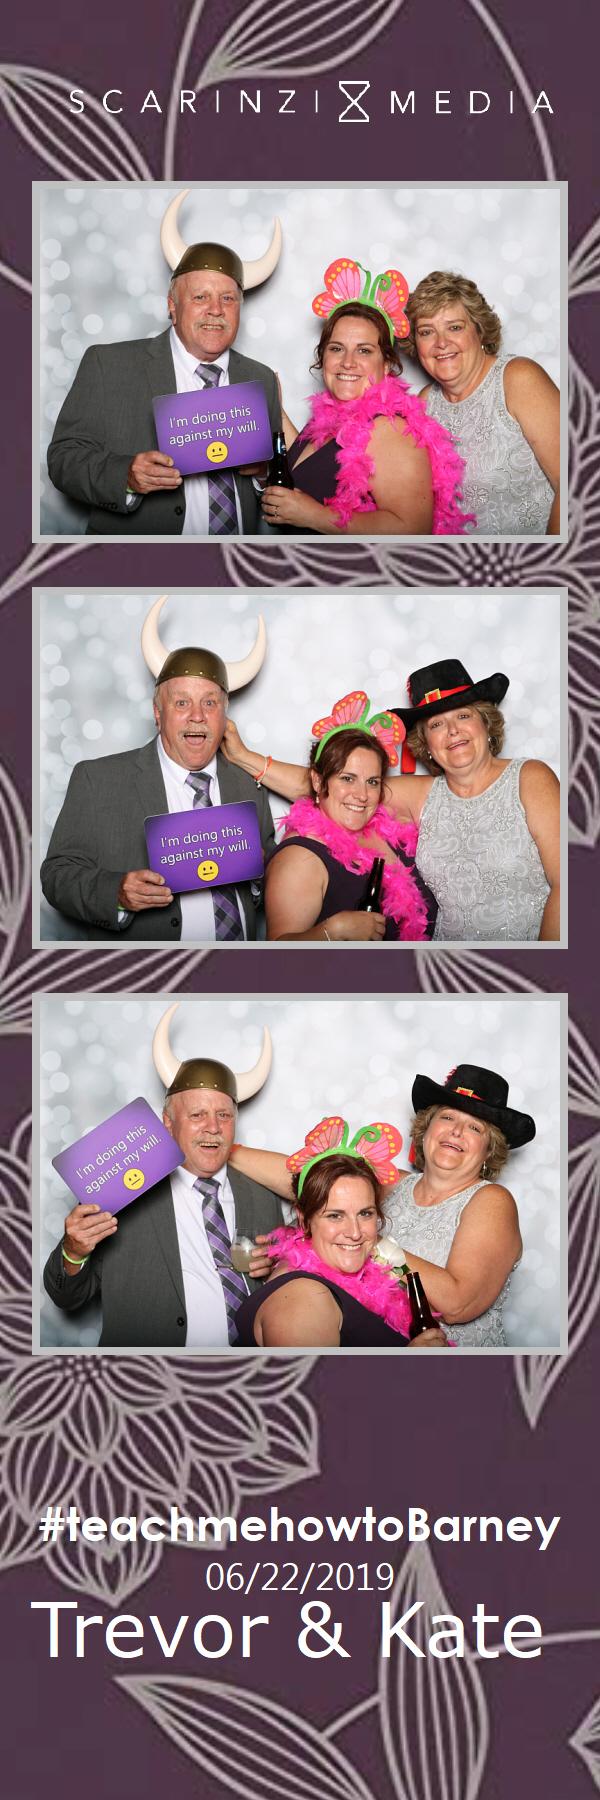 2019.06.22 - Barney Wedding PHOTOBOOTH61.jpg